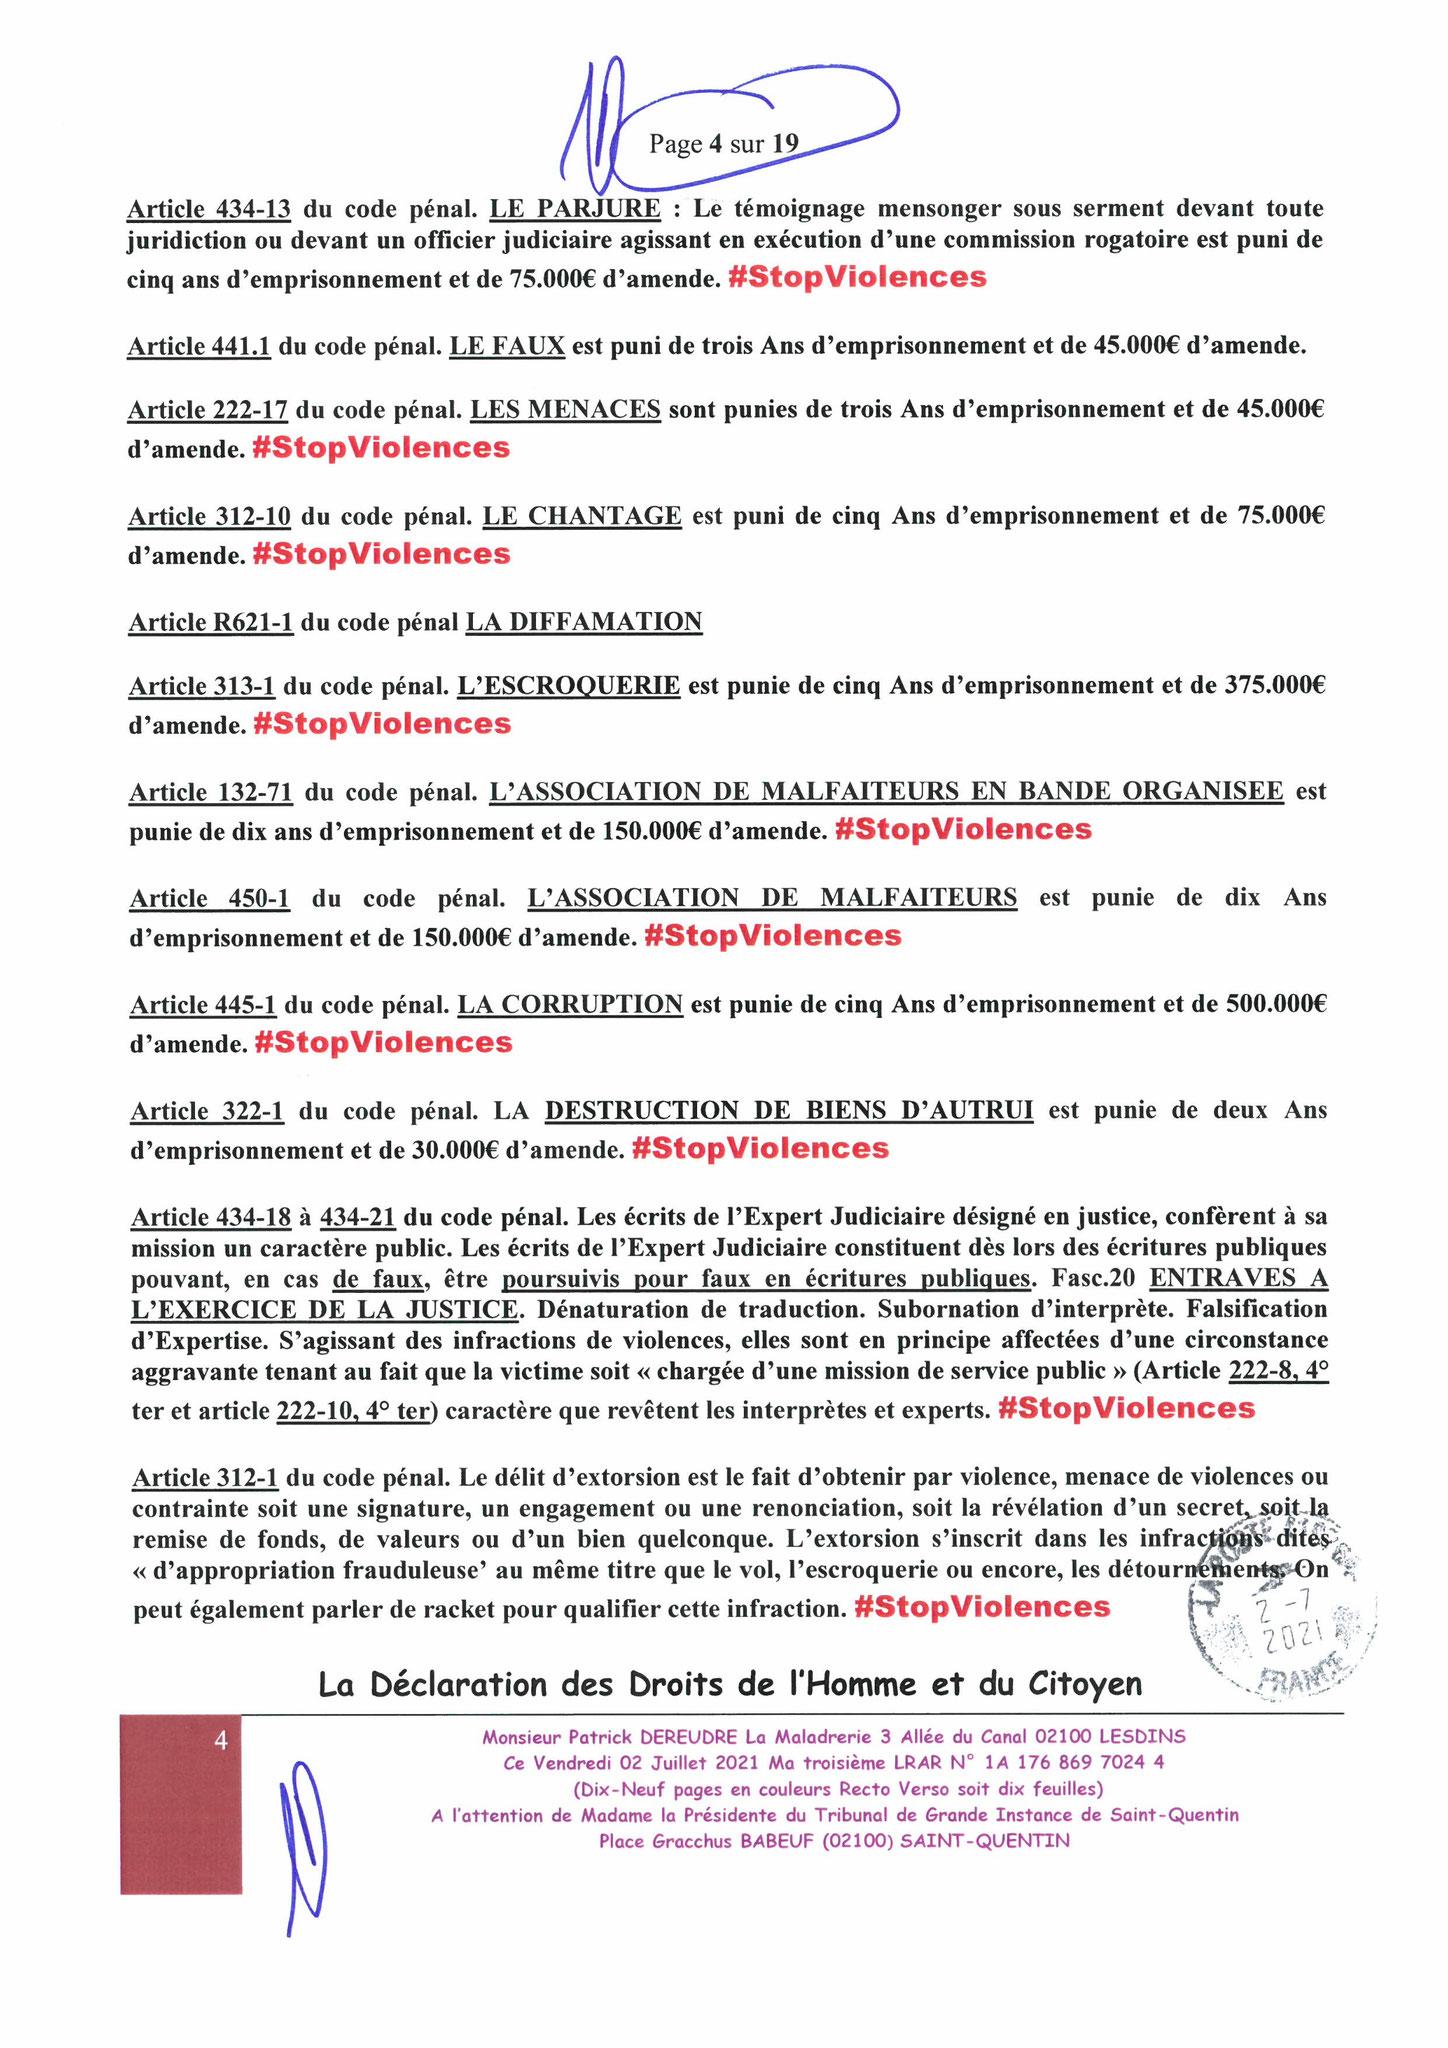 "Affaires mes chers voisins LRAR PRESIDENTE TGI STQ du 02 Juillet 2021 au TGI de Saint-Quentin #StopVendetta #StopFauxEnEcrituresPubliques ""#StopFalsifications #StopTorturesMentales w.jenesuispasunchien.fr www.jesuisvictime.fr www.Jesuispatrick.fr"